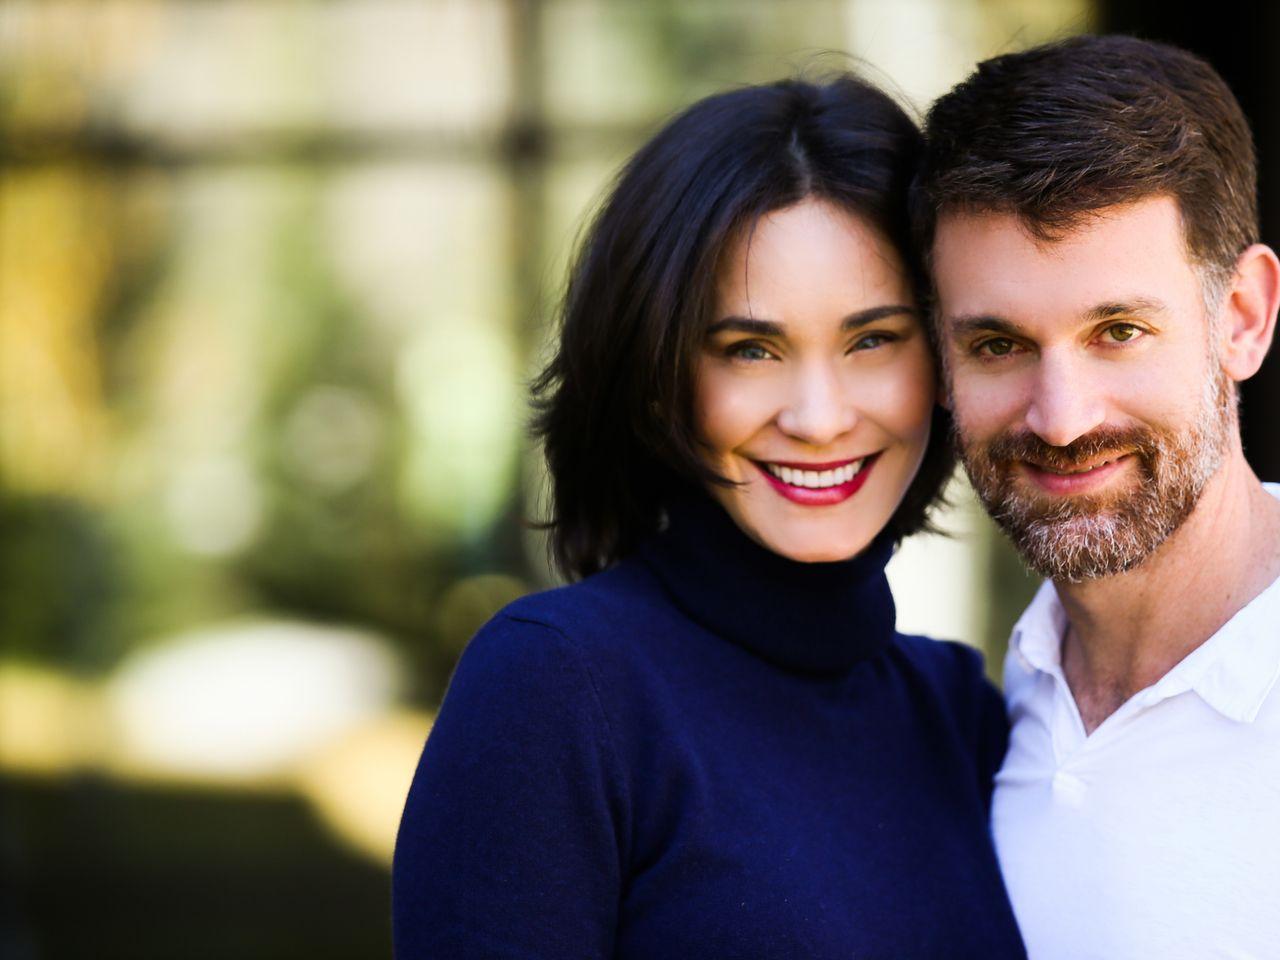 Billionaire couple pledges to donate 5% of wealth — why that still riles  critics of elite philanthropy - MarketWatch